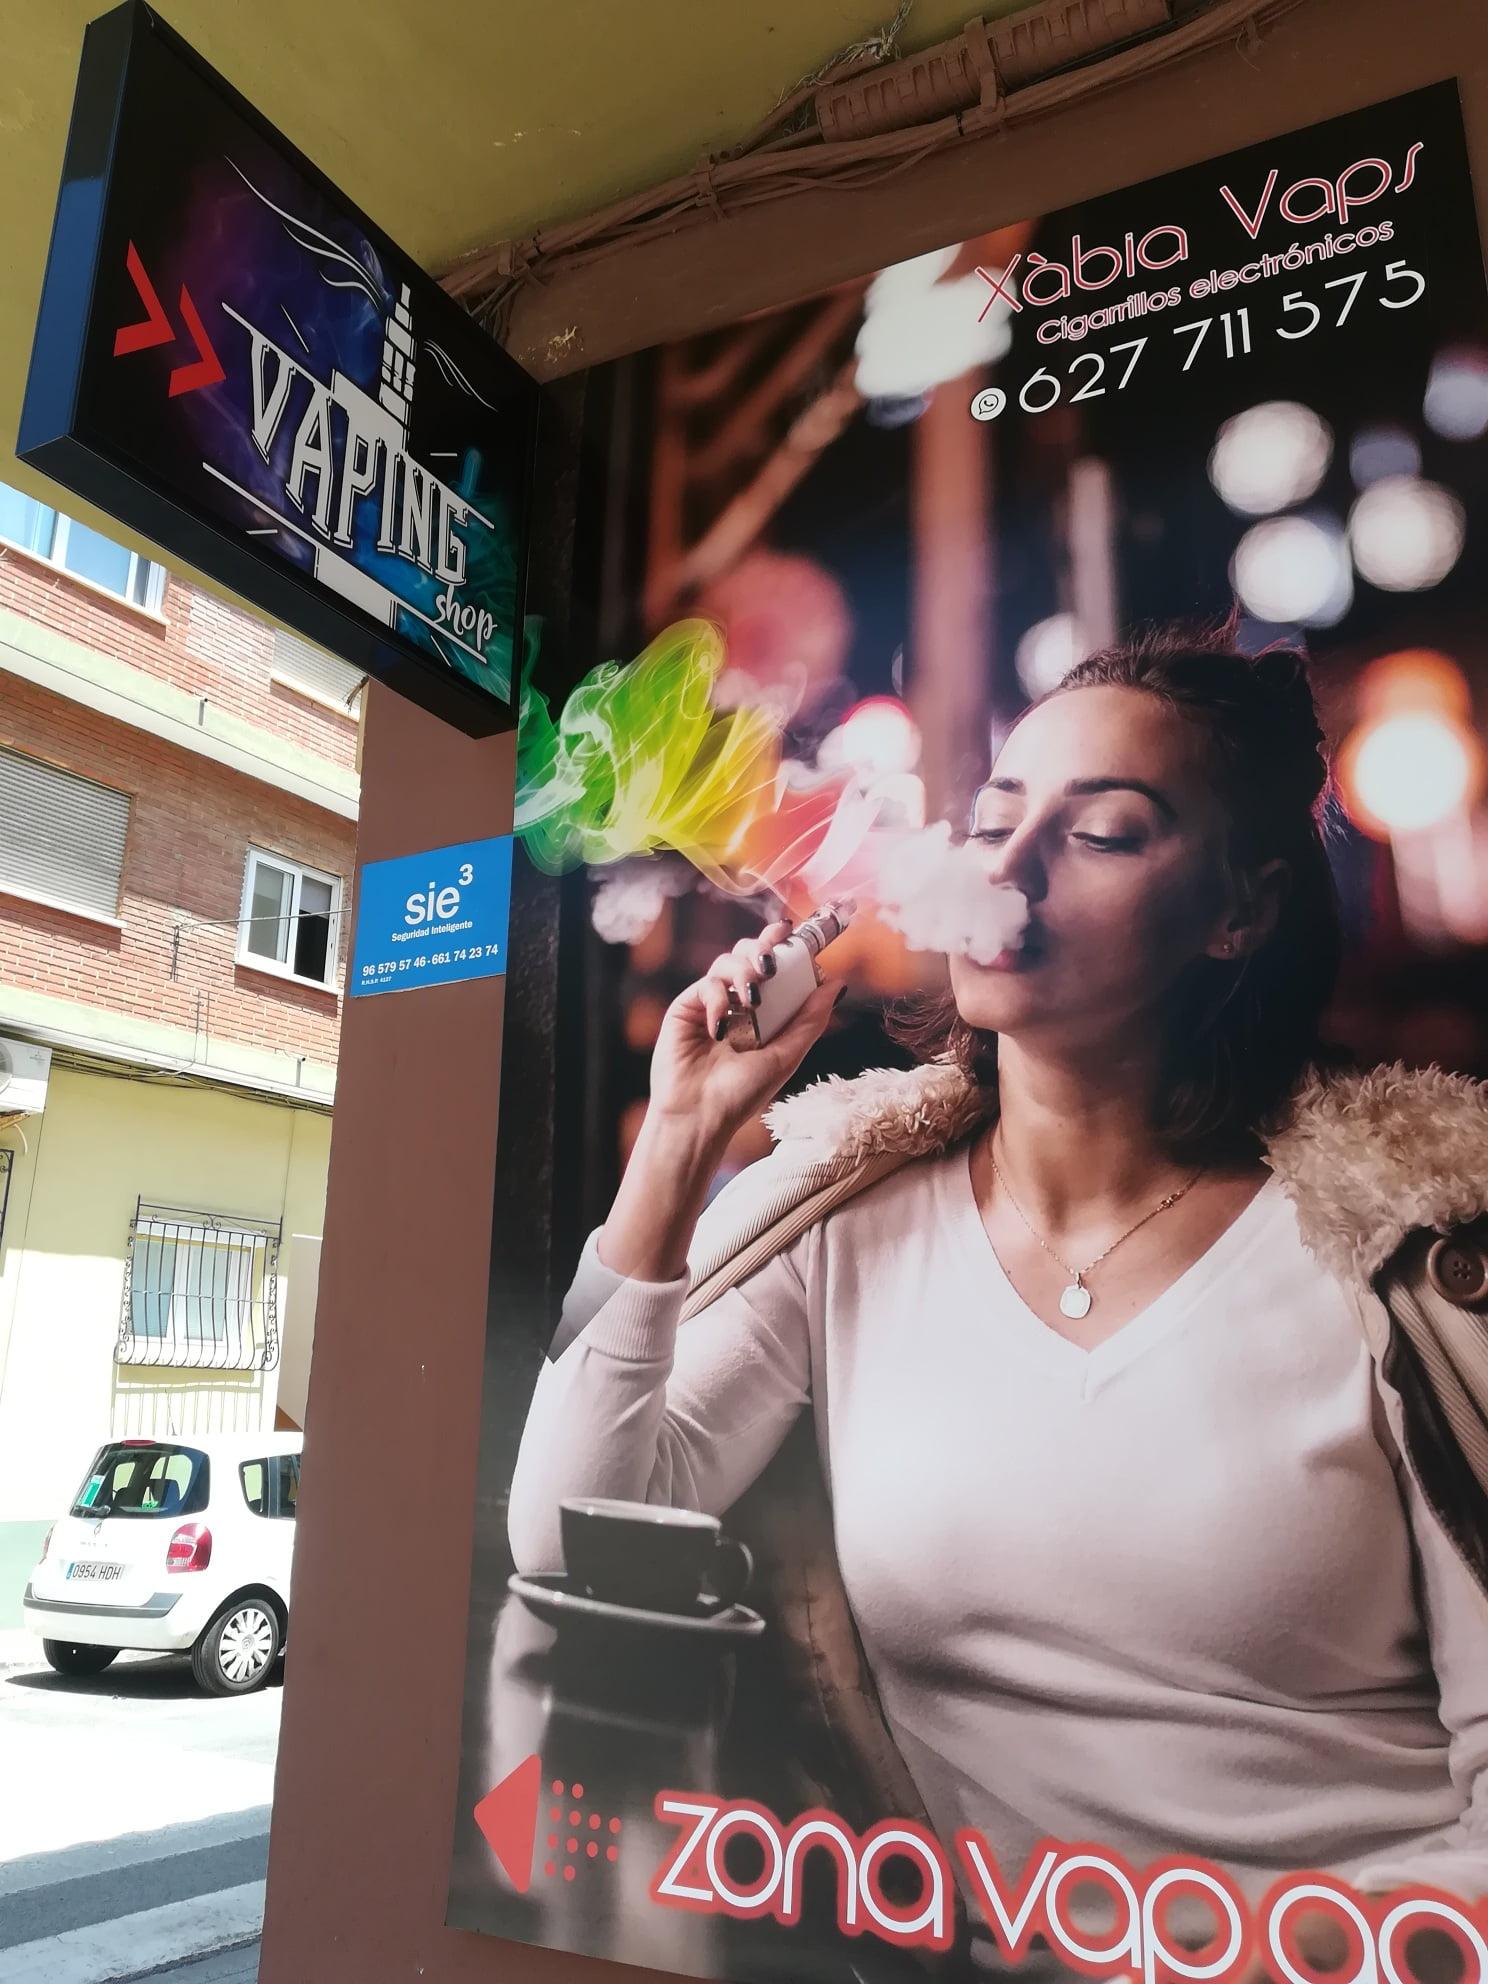 Tienda vapeo en Jávea – Xàbia Vaps